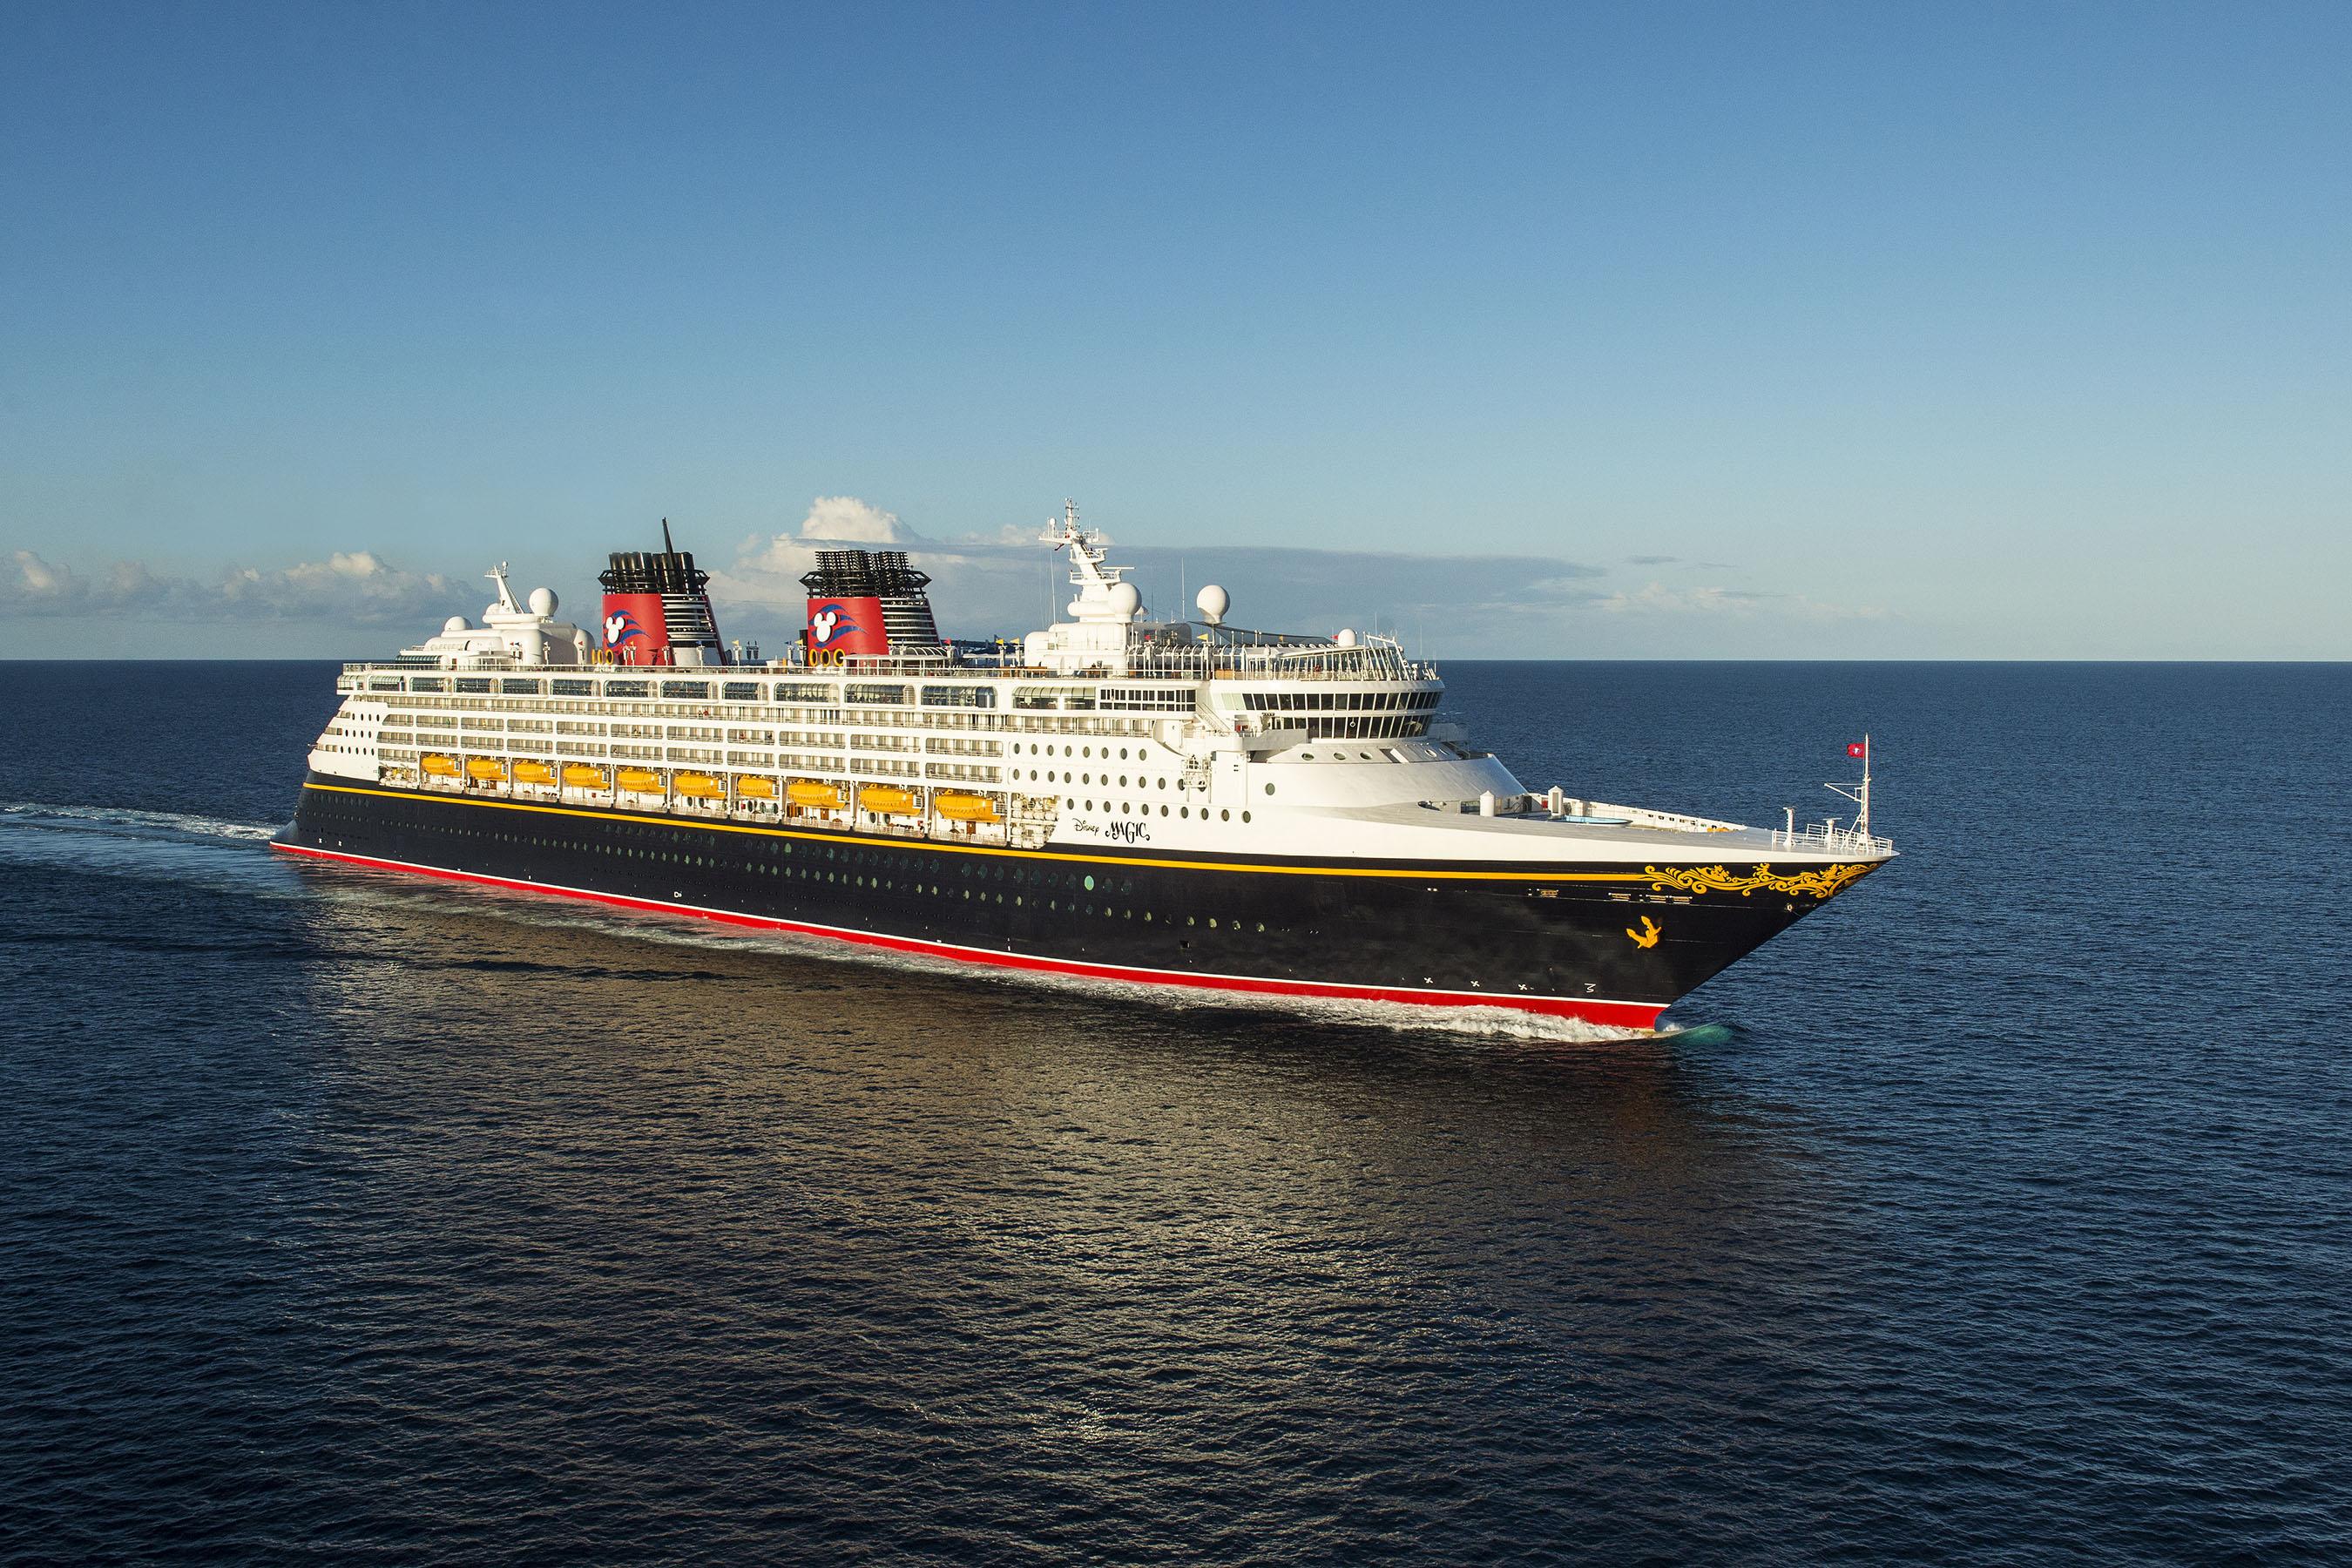 Disney Magic fra Disney Cruise Line. (Foto: Disney Cruise Line)